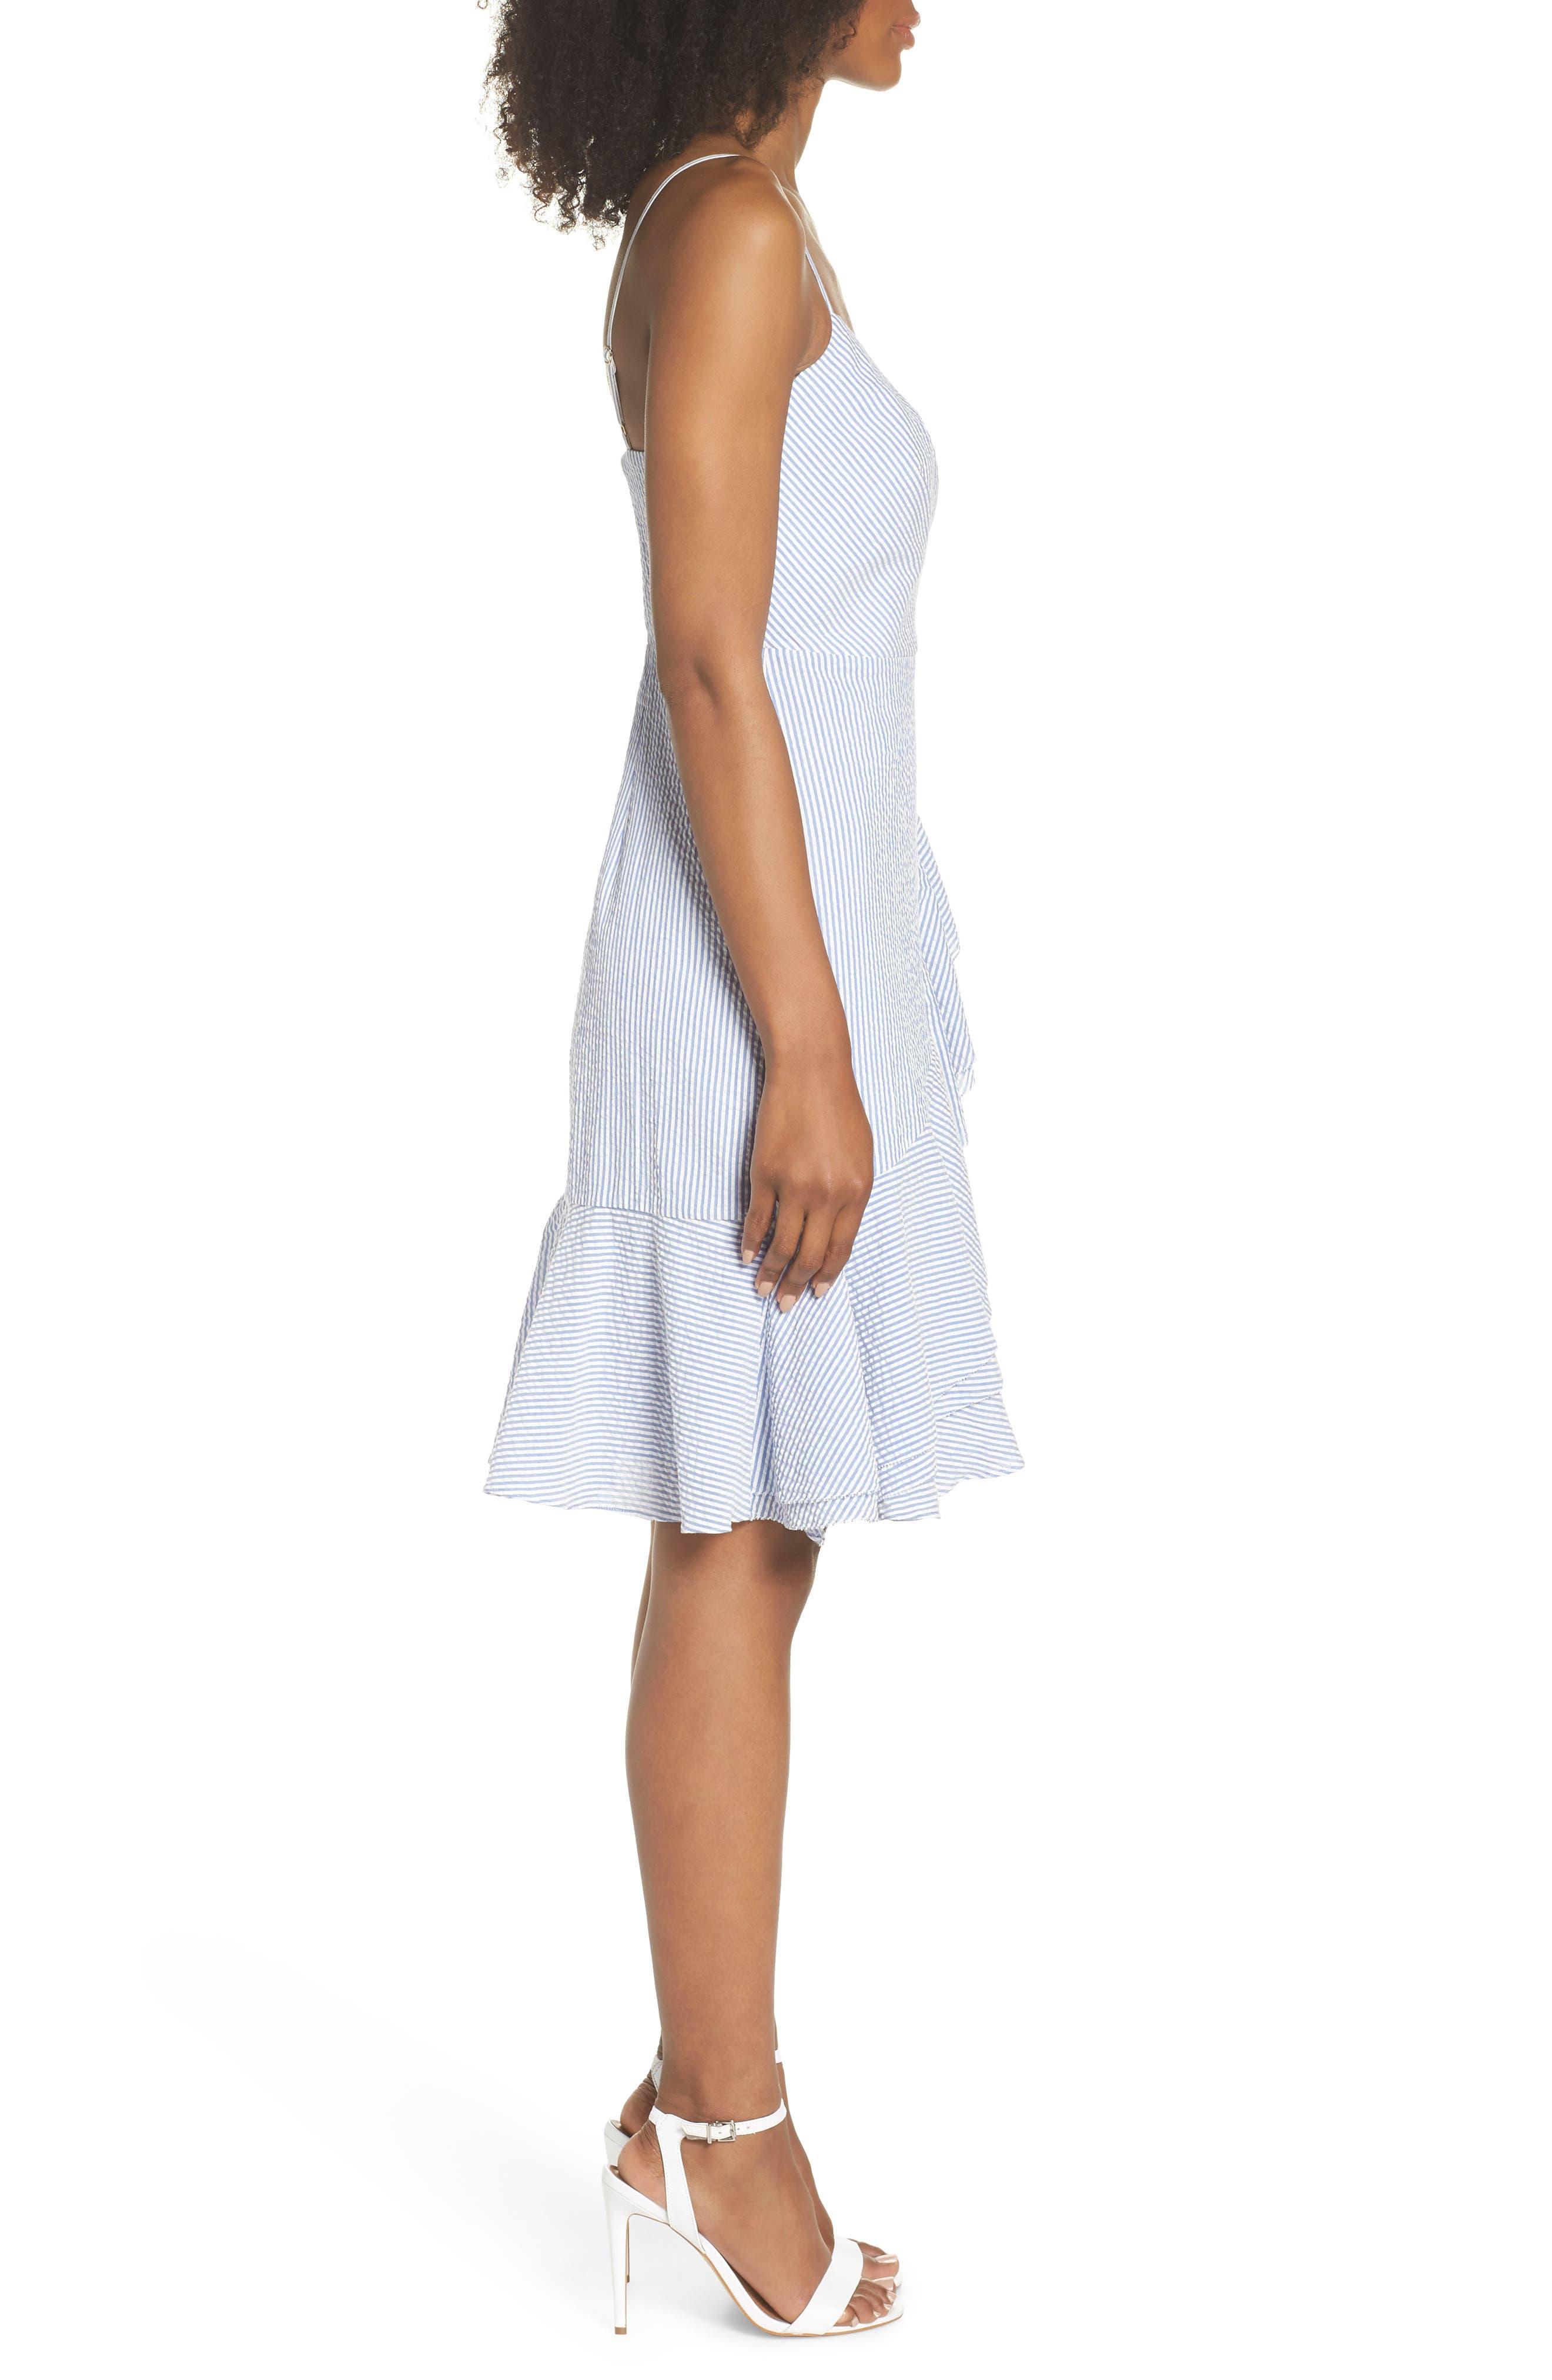 J.Crew Spaghetti Strap Ruffle Dress,                             Alternate thumbnail 3, color,                             Blue White